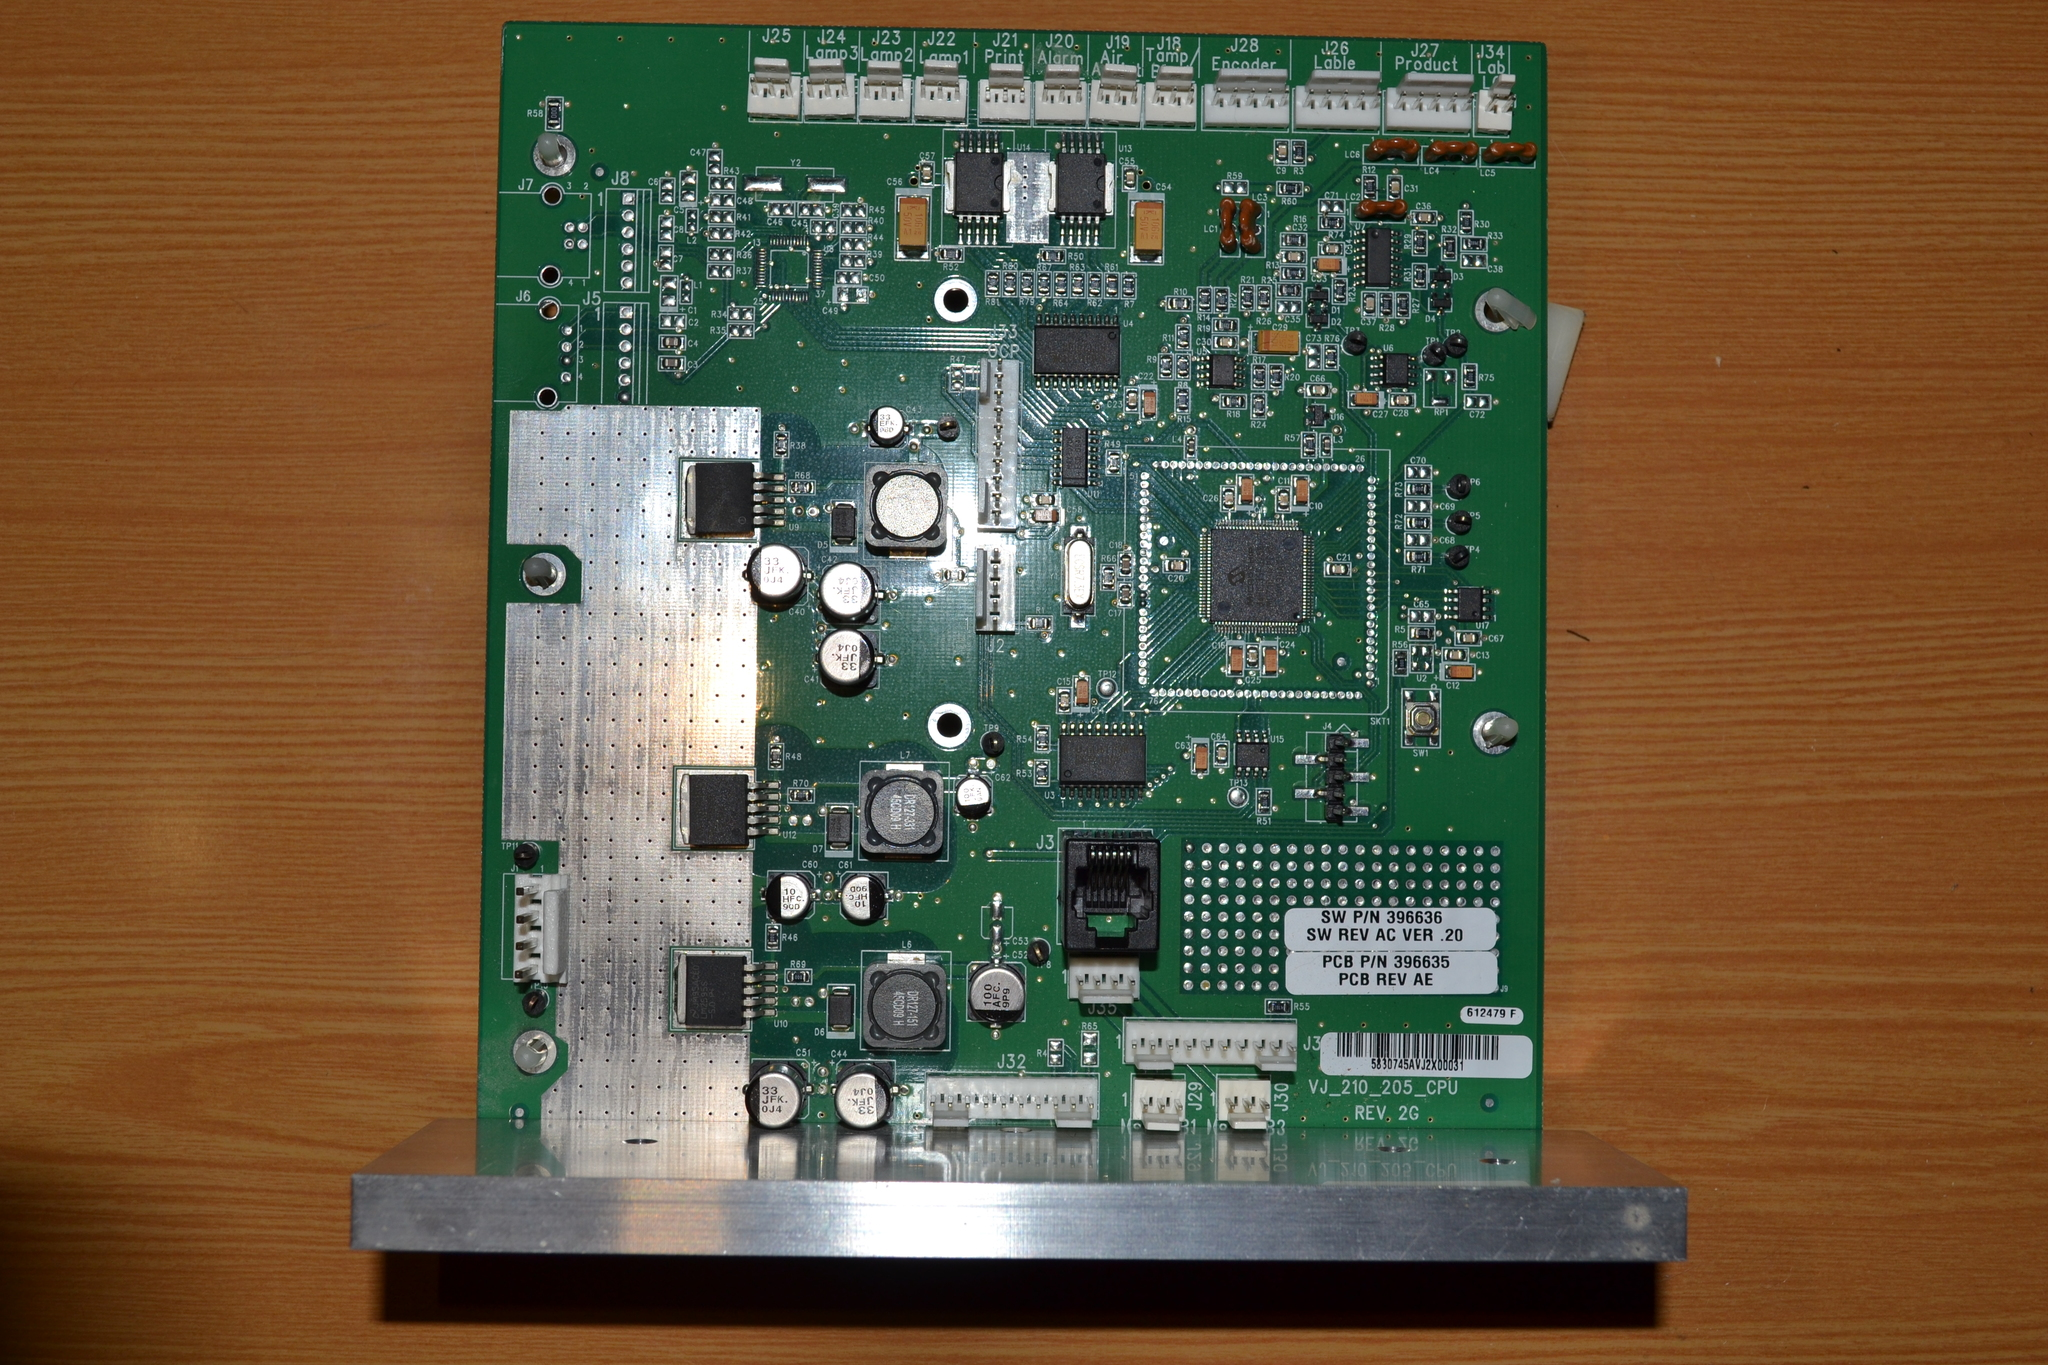 VJ_210_205_CPU